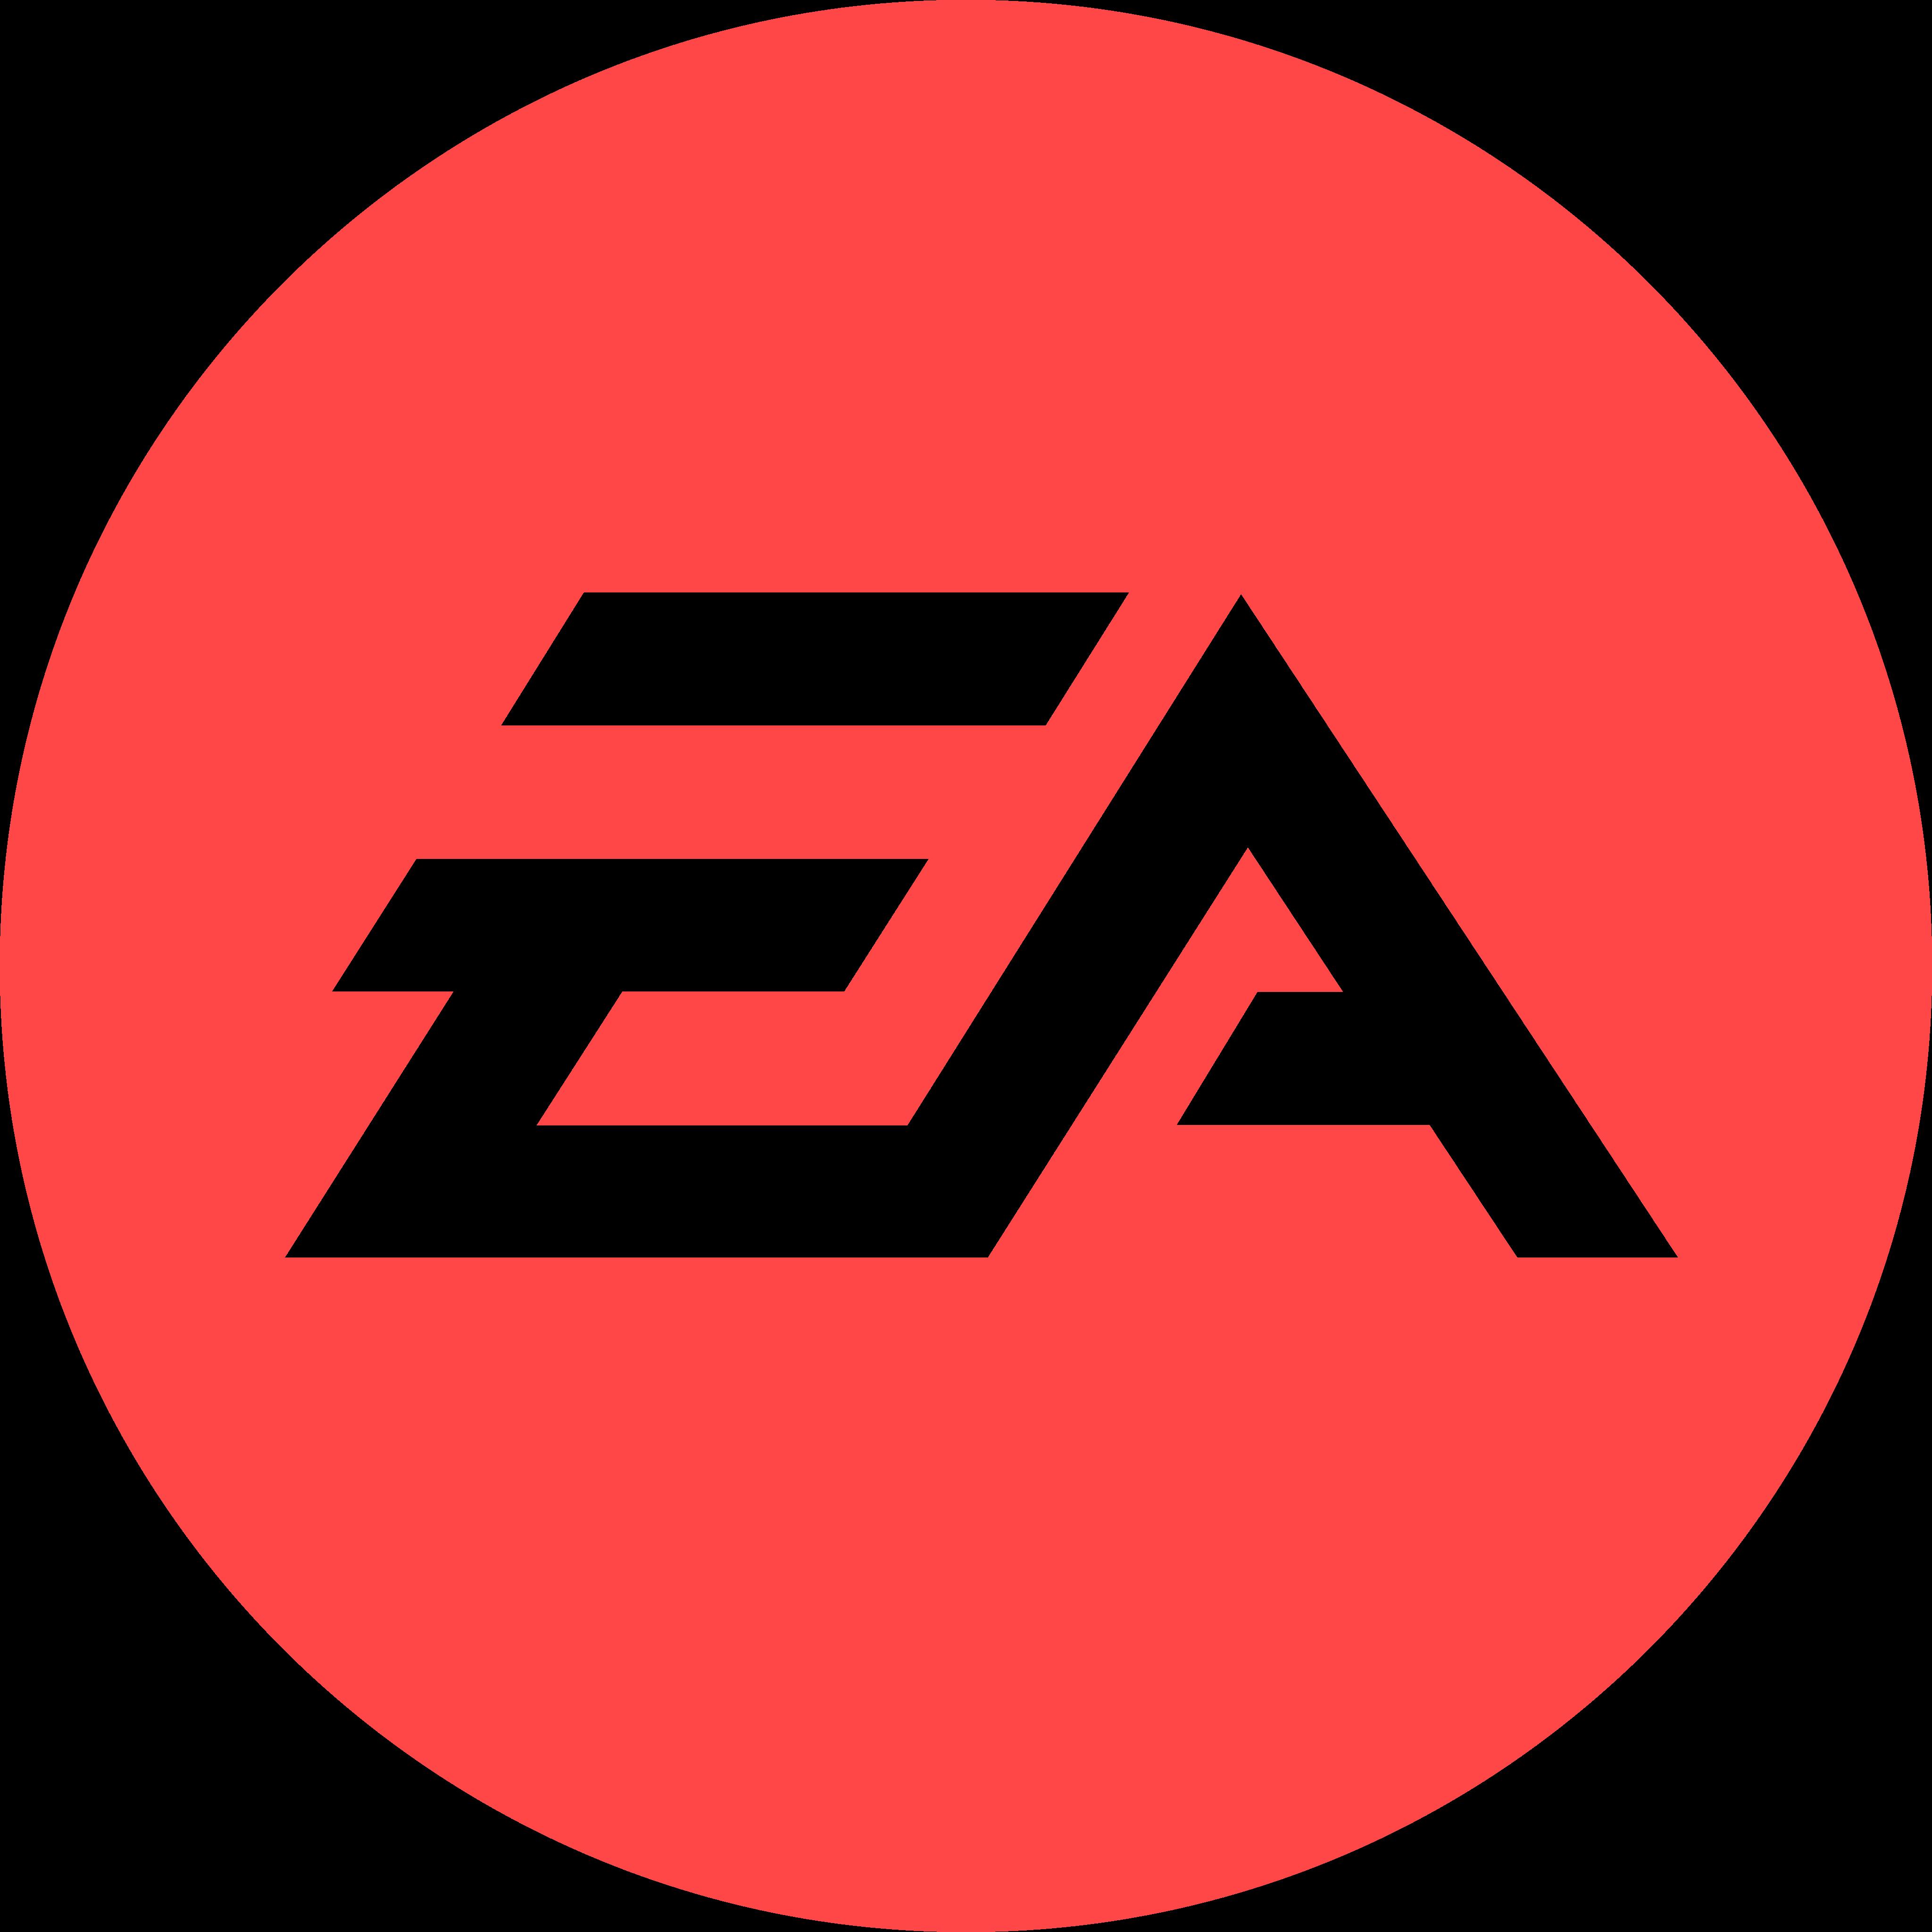 electronic arts logo 1 - Electronic Arts Logo